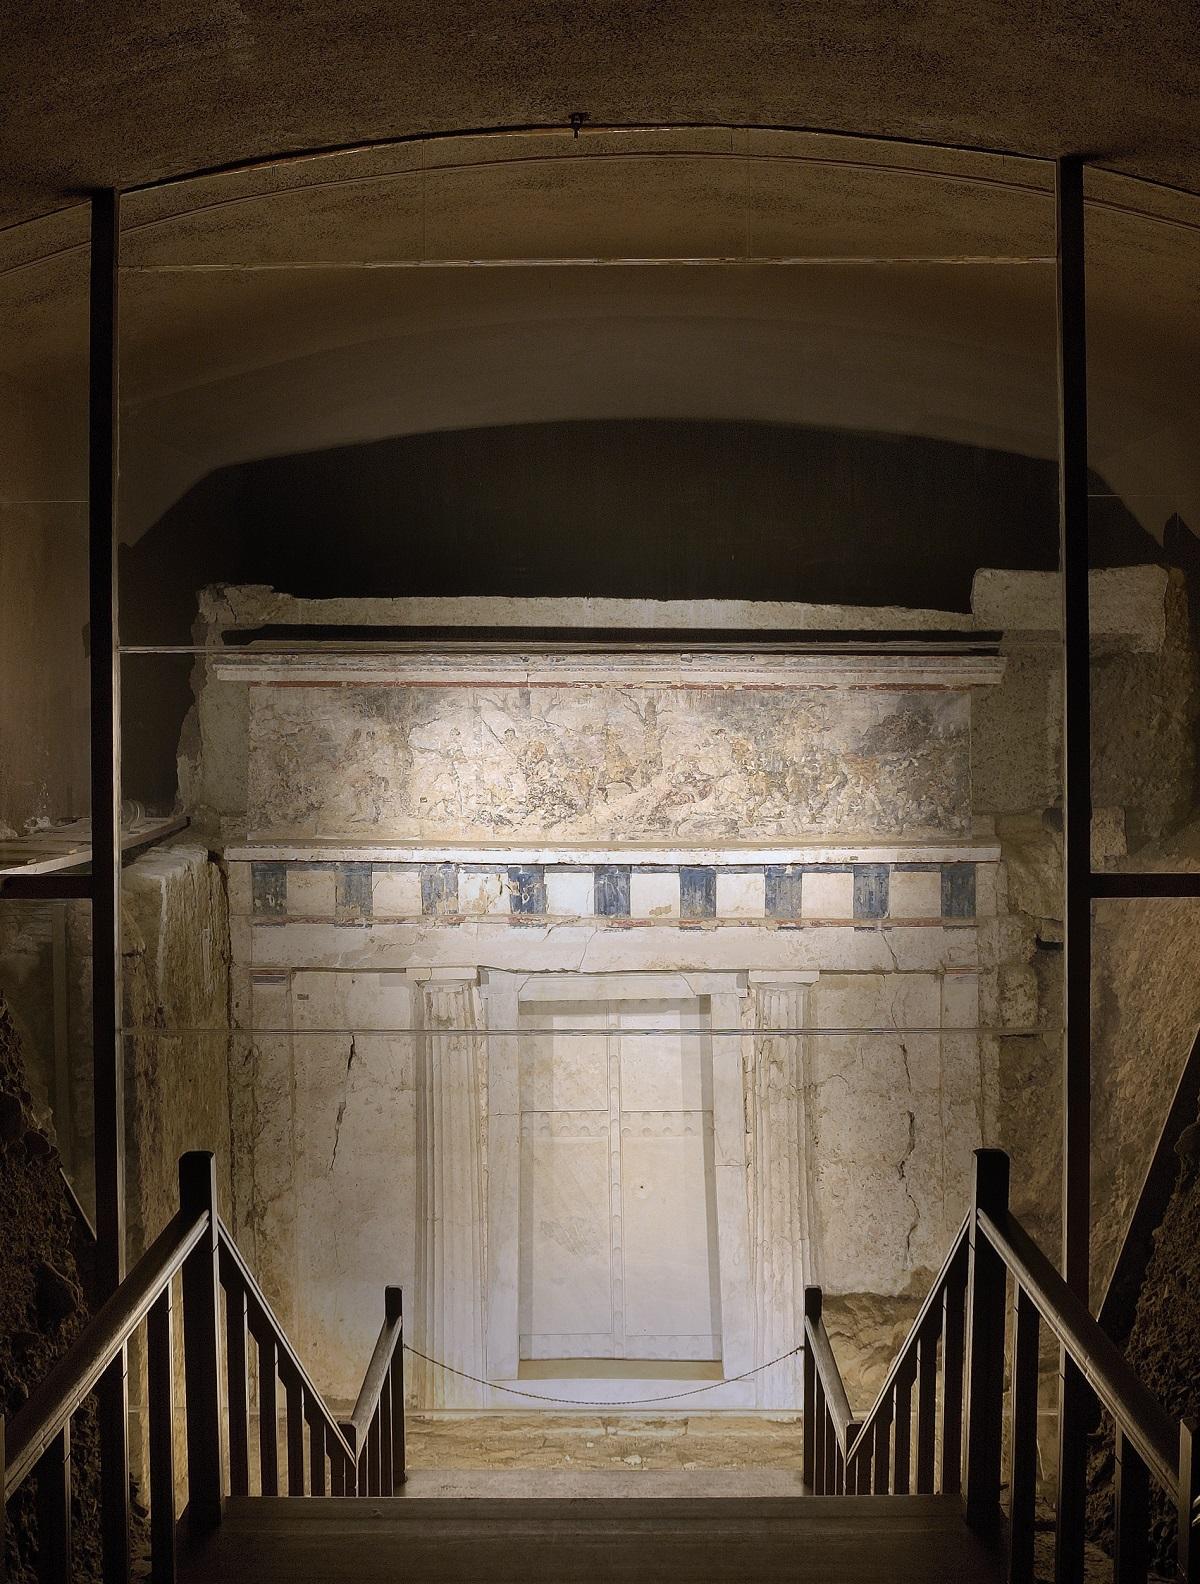 Tomb of Phillip II